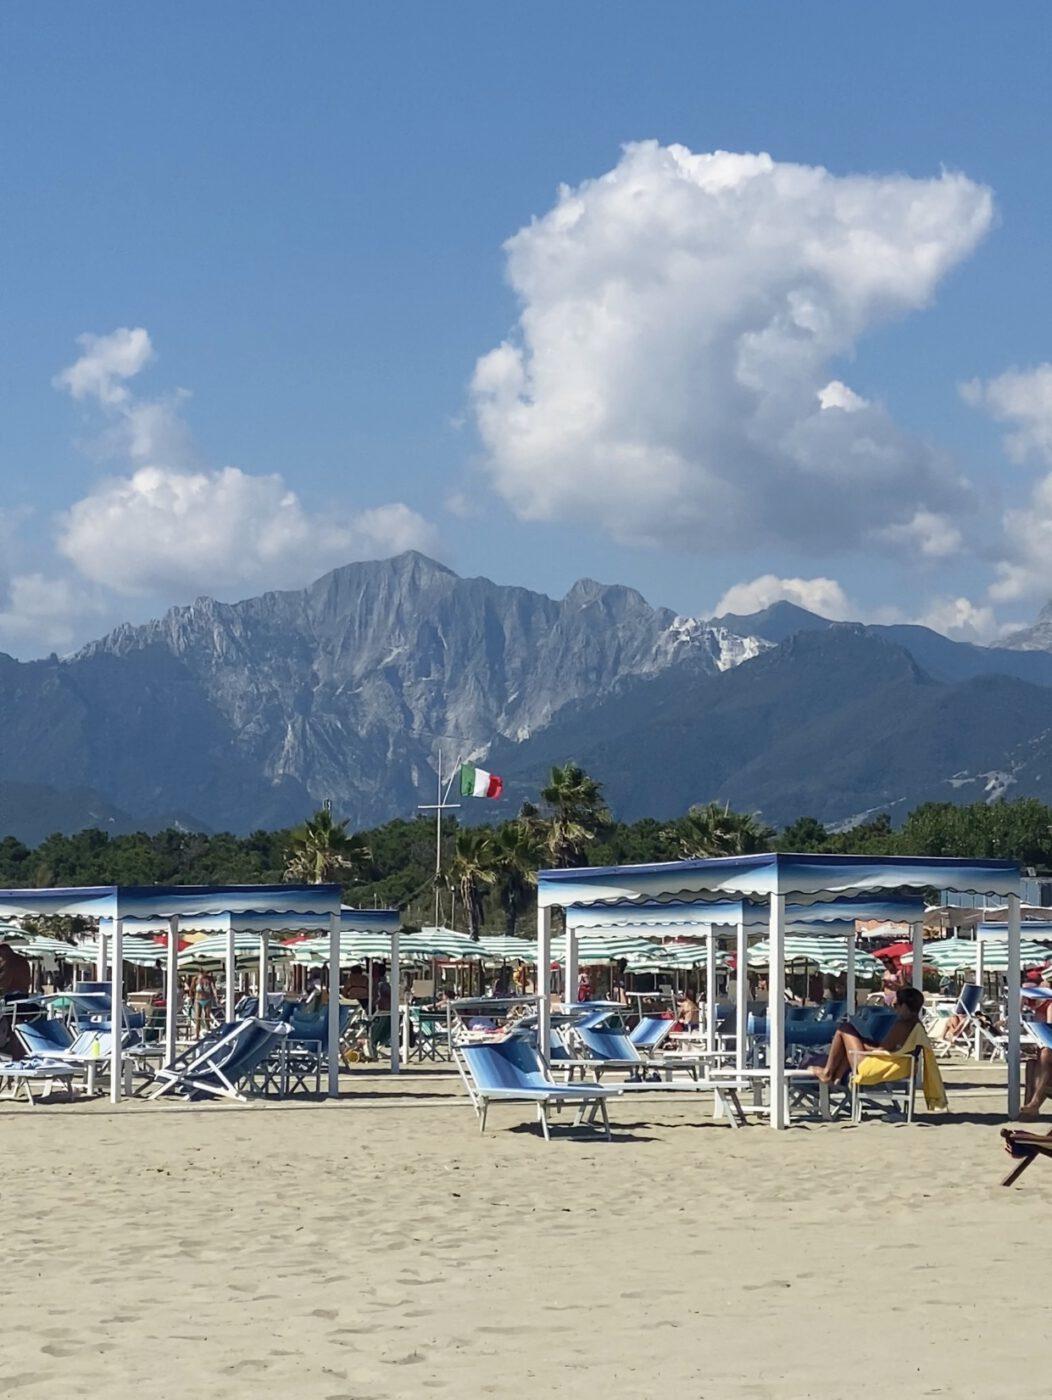 Versilia: where the Sea meets the Mountains